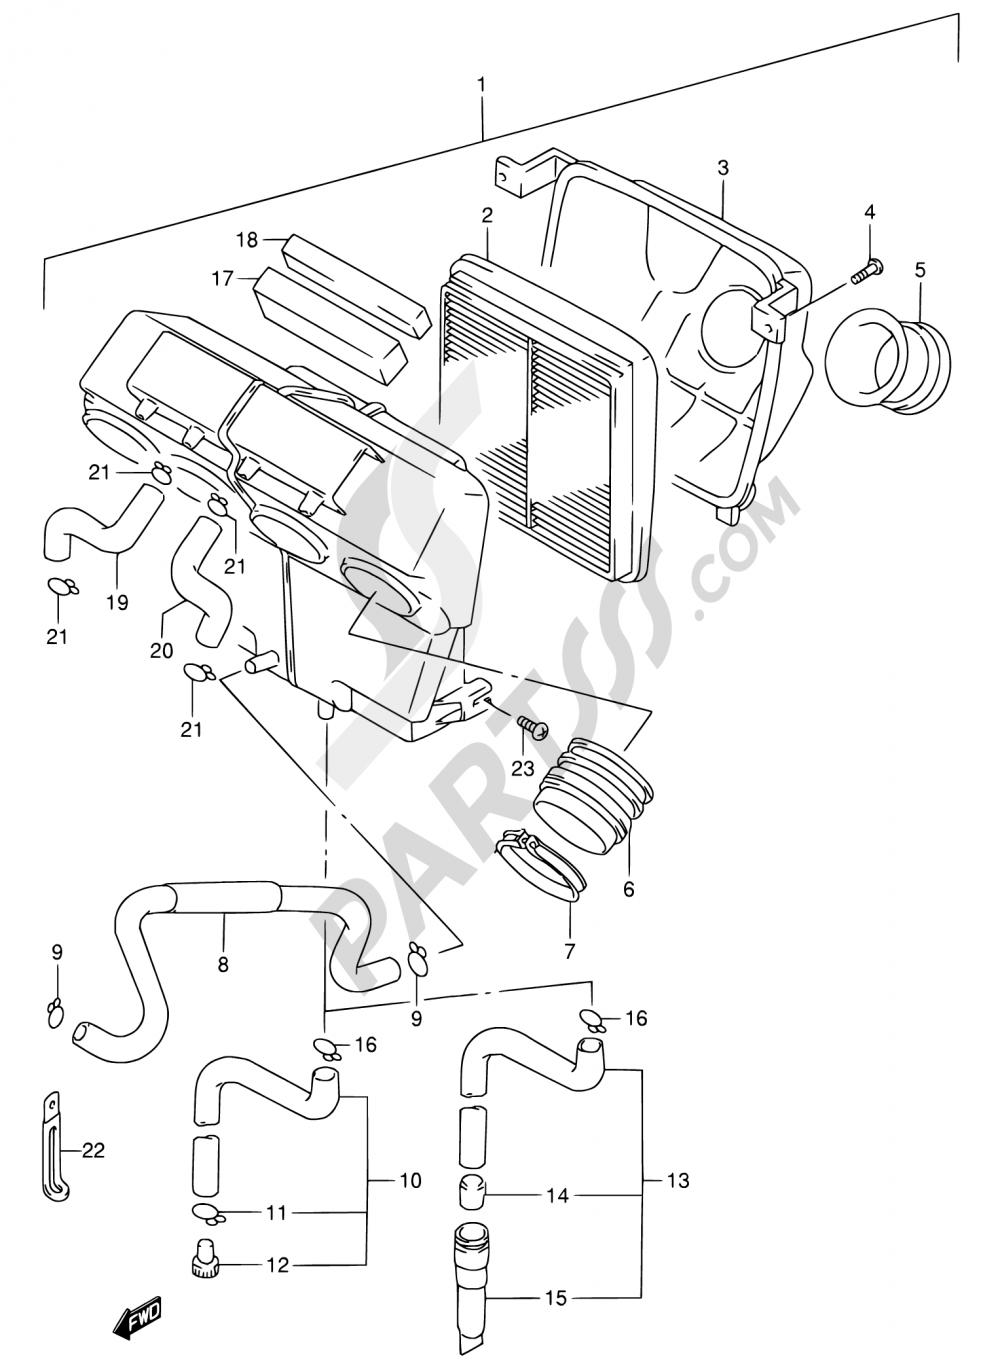 13 - AIR CLEANER Suzuki RF900R 1996